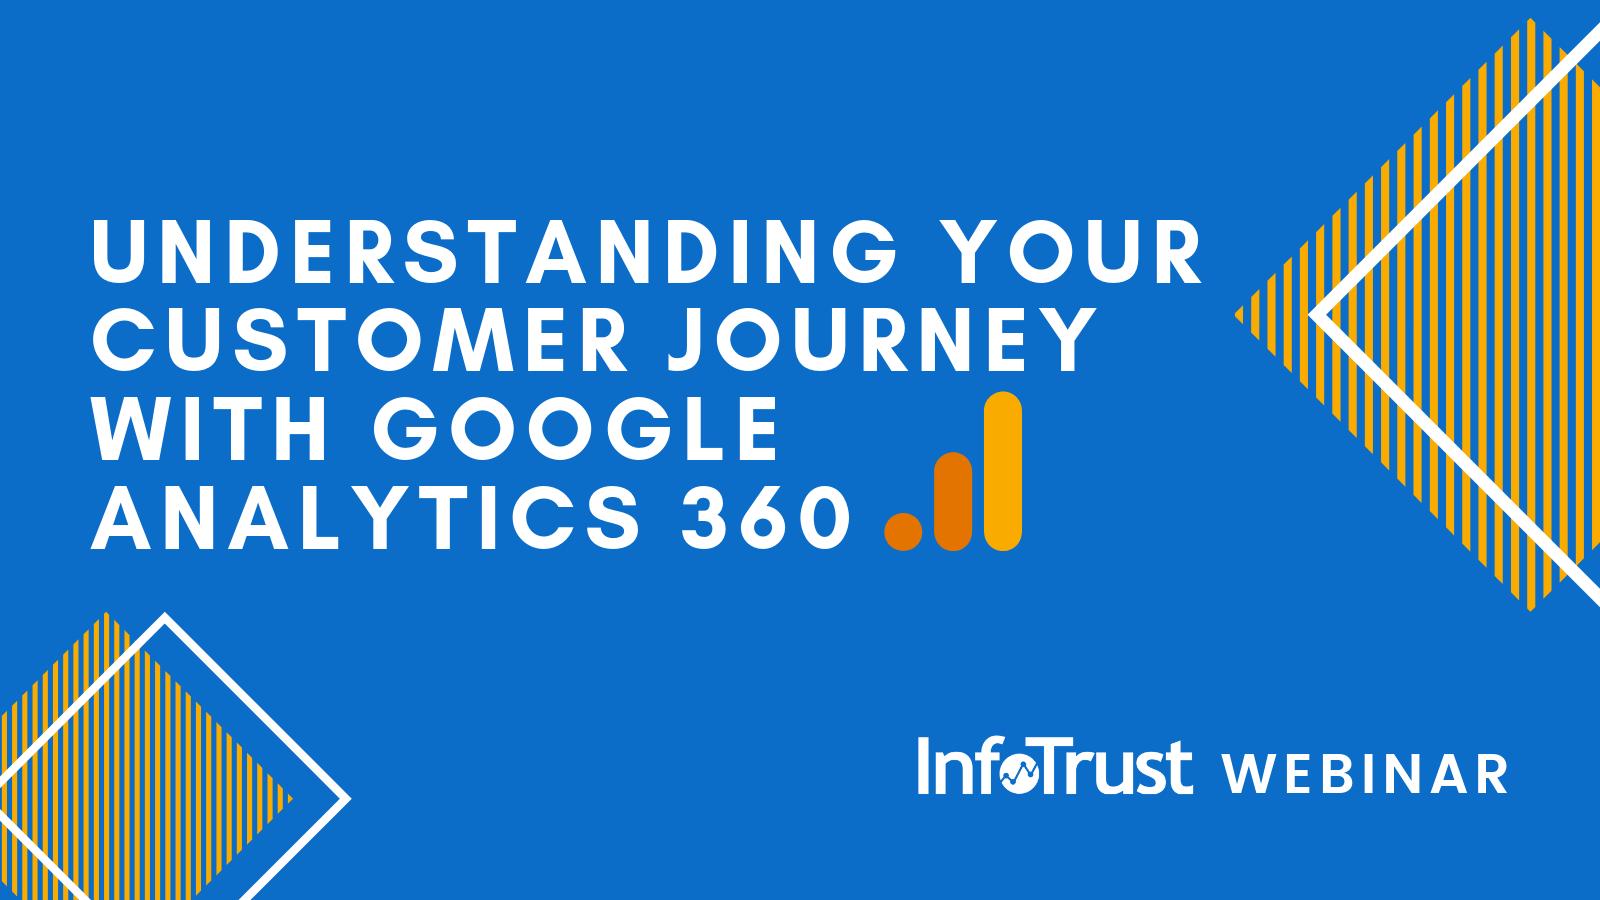 Understanding Your Customer Journey with Google Analytics 360